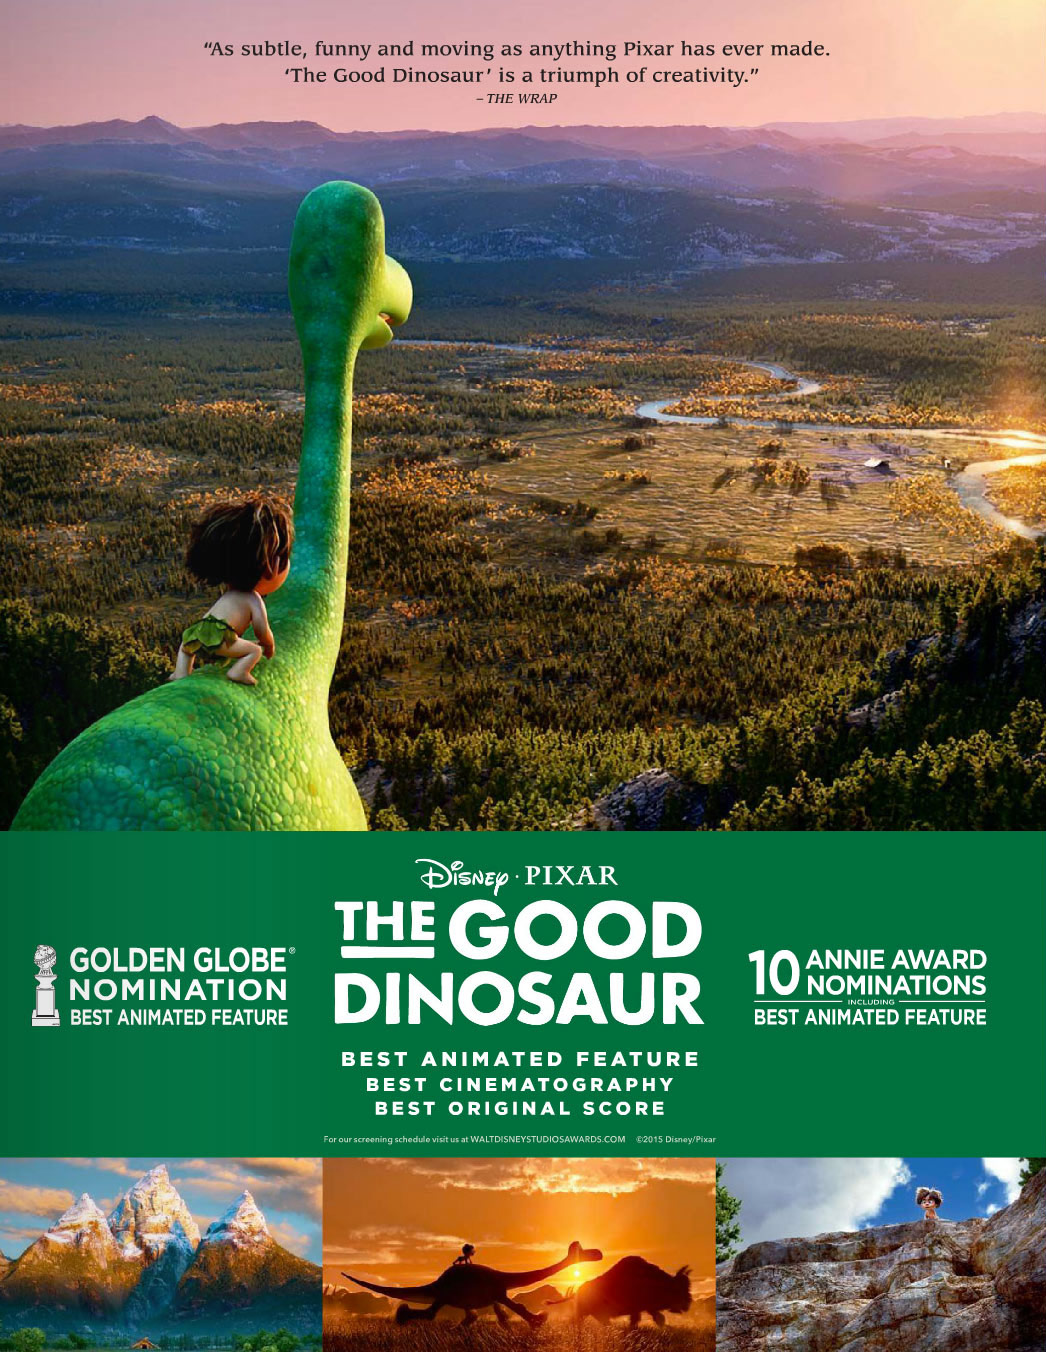 gooddinosaur4_big.jpg